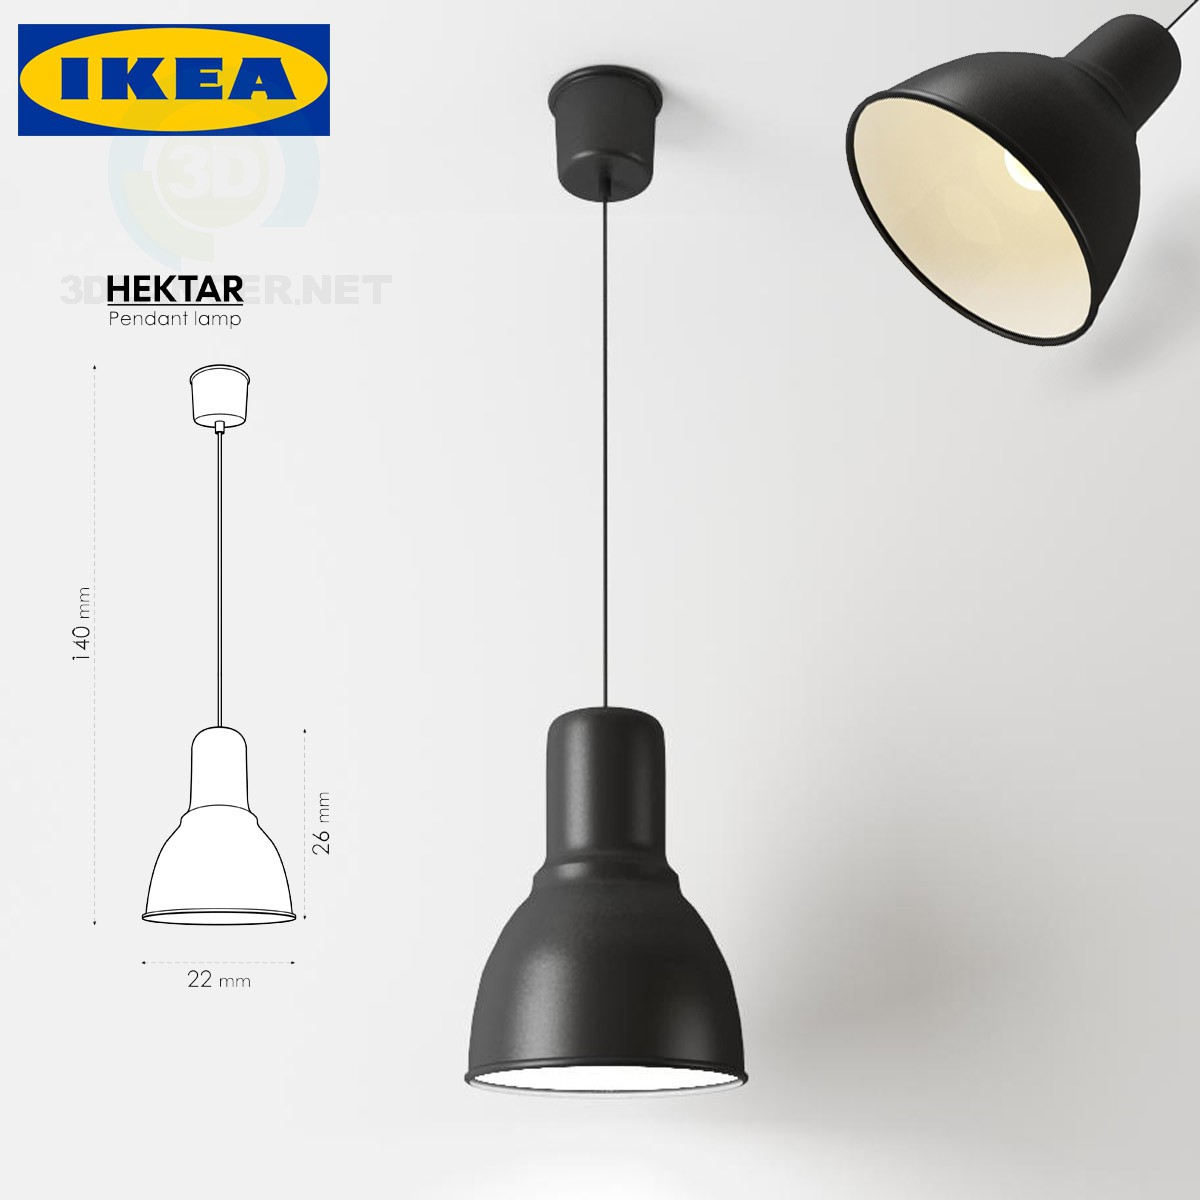 3d model HEKTAR_Pendant lamp - preview